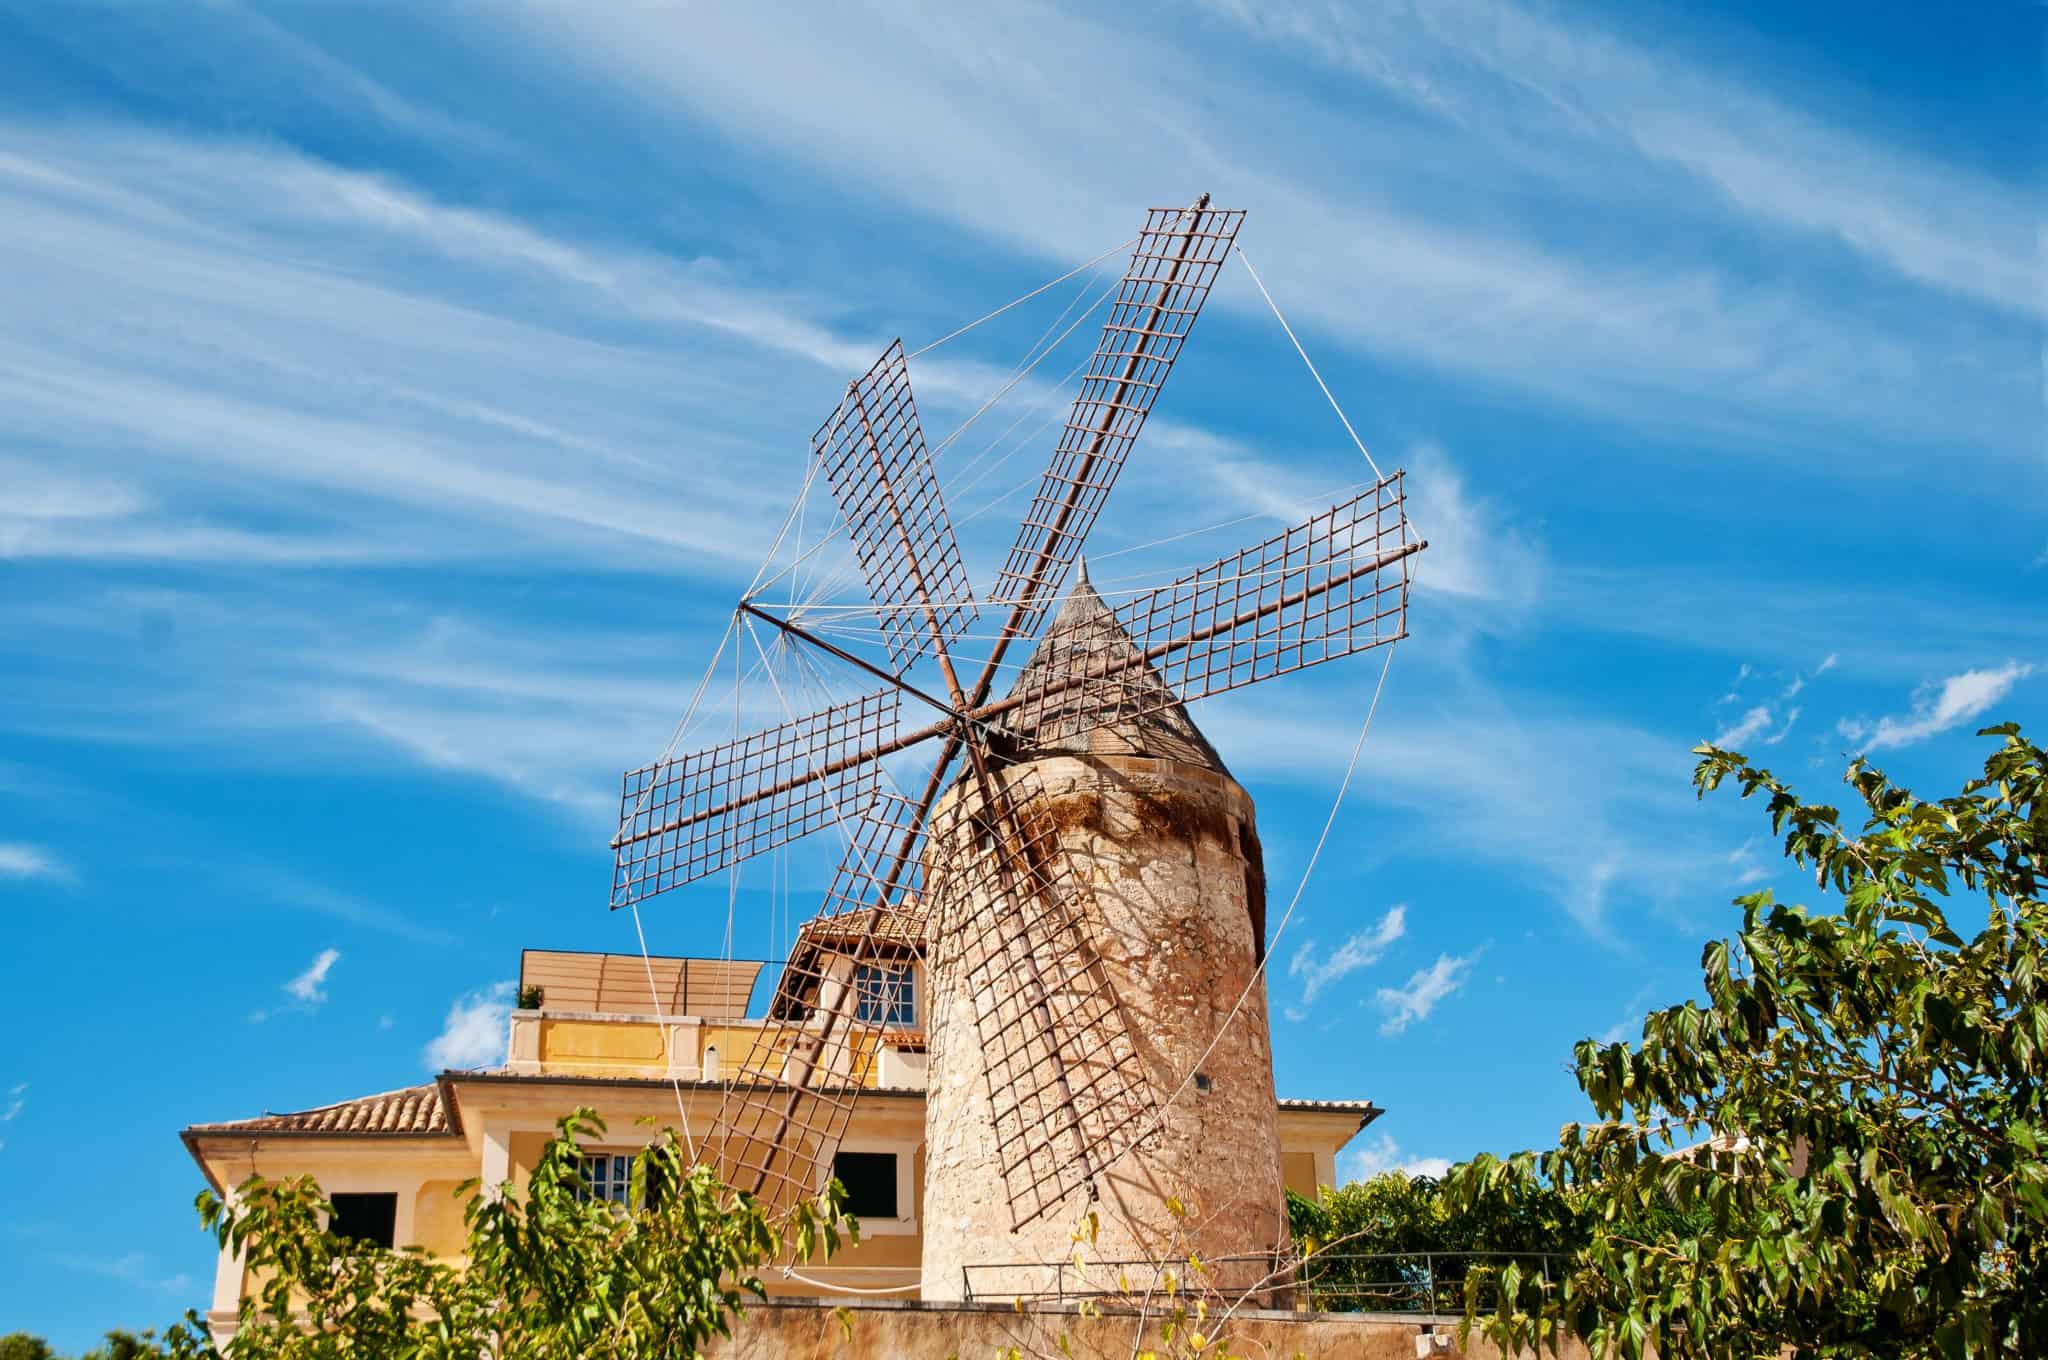 Mallorquinische Windmühle auf Mallorca